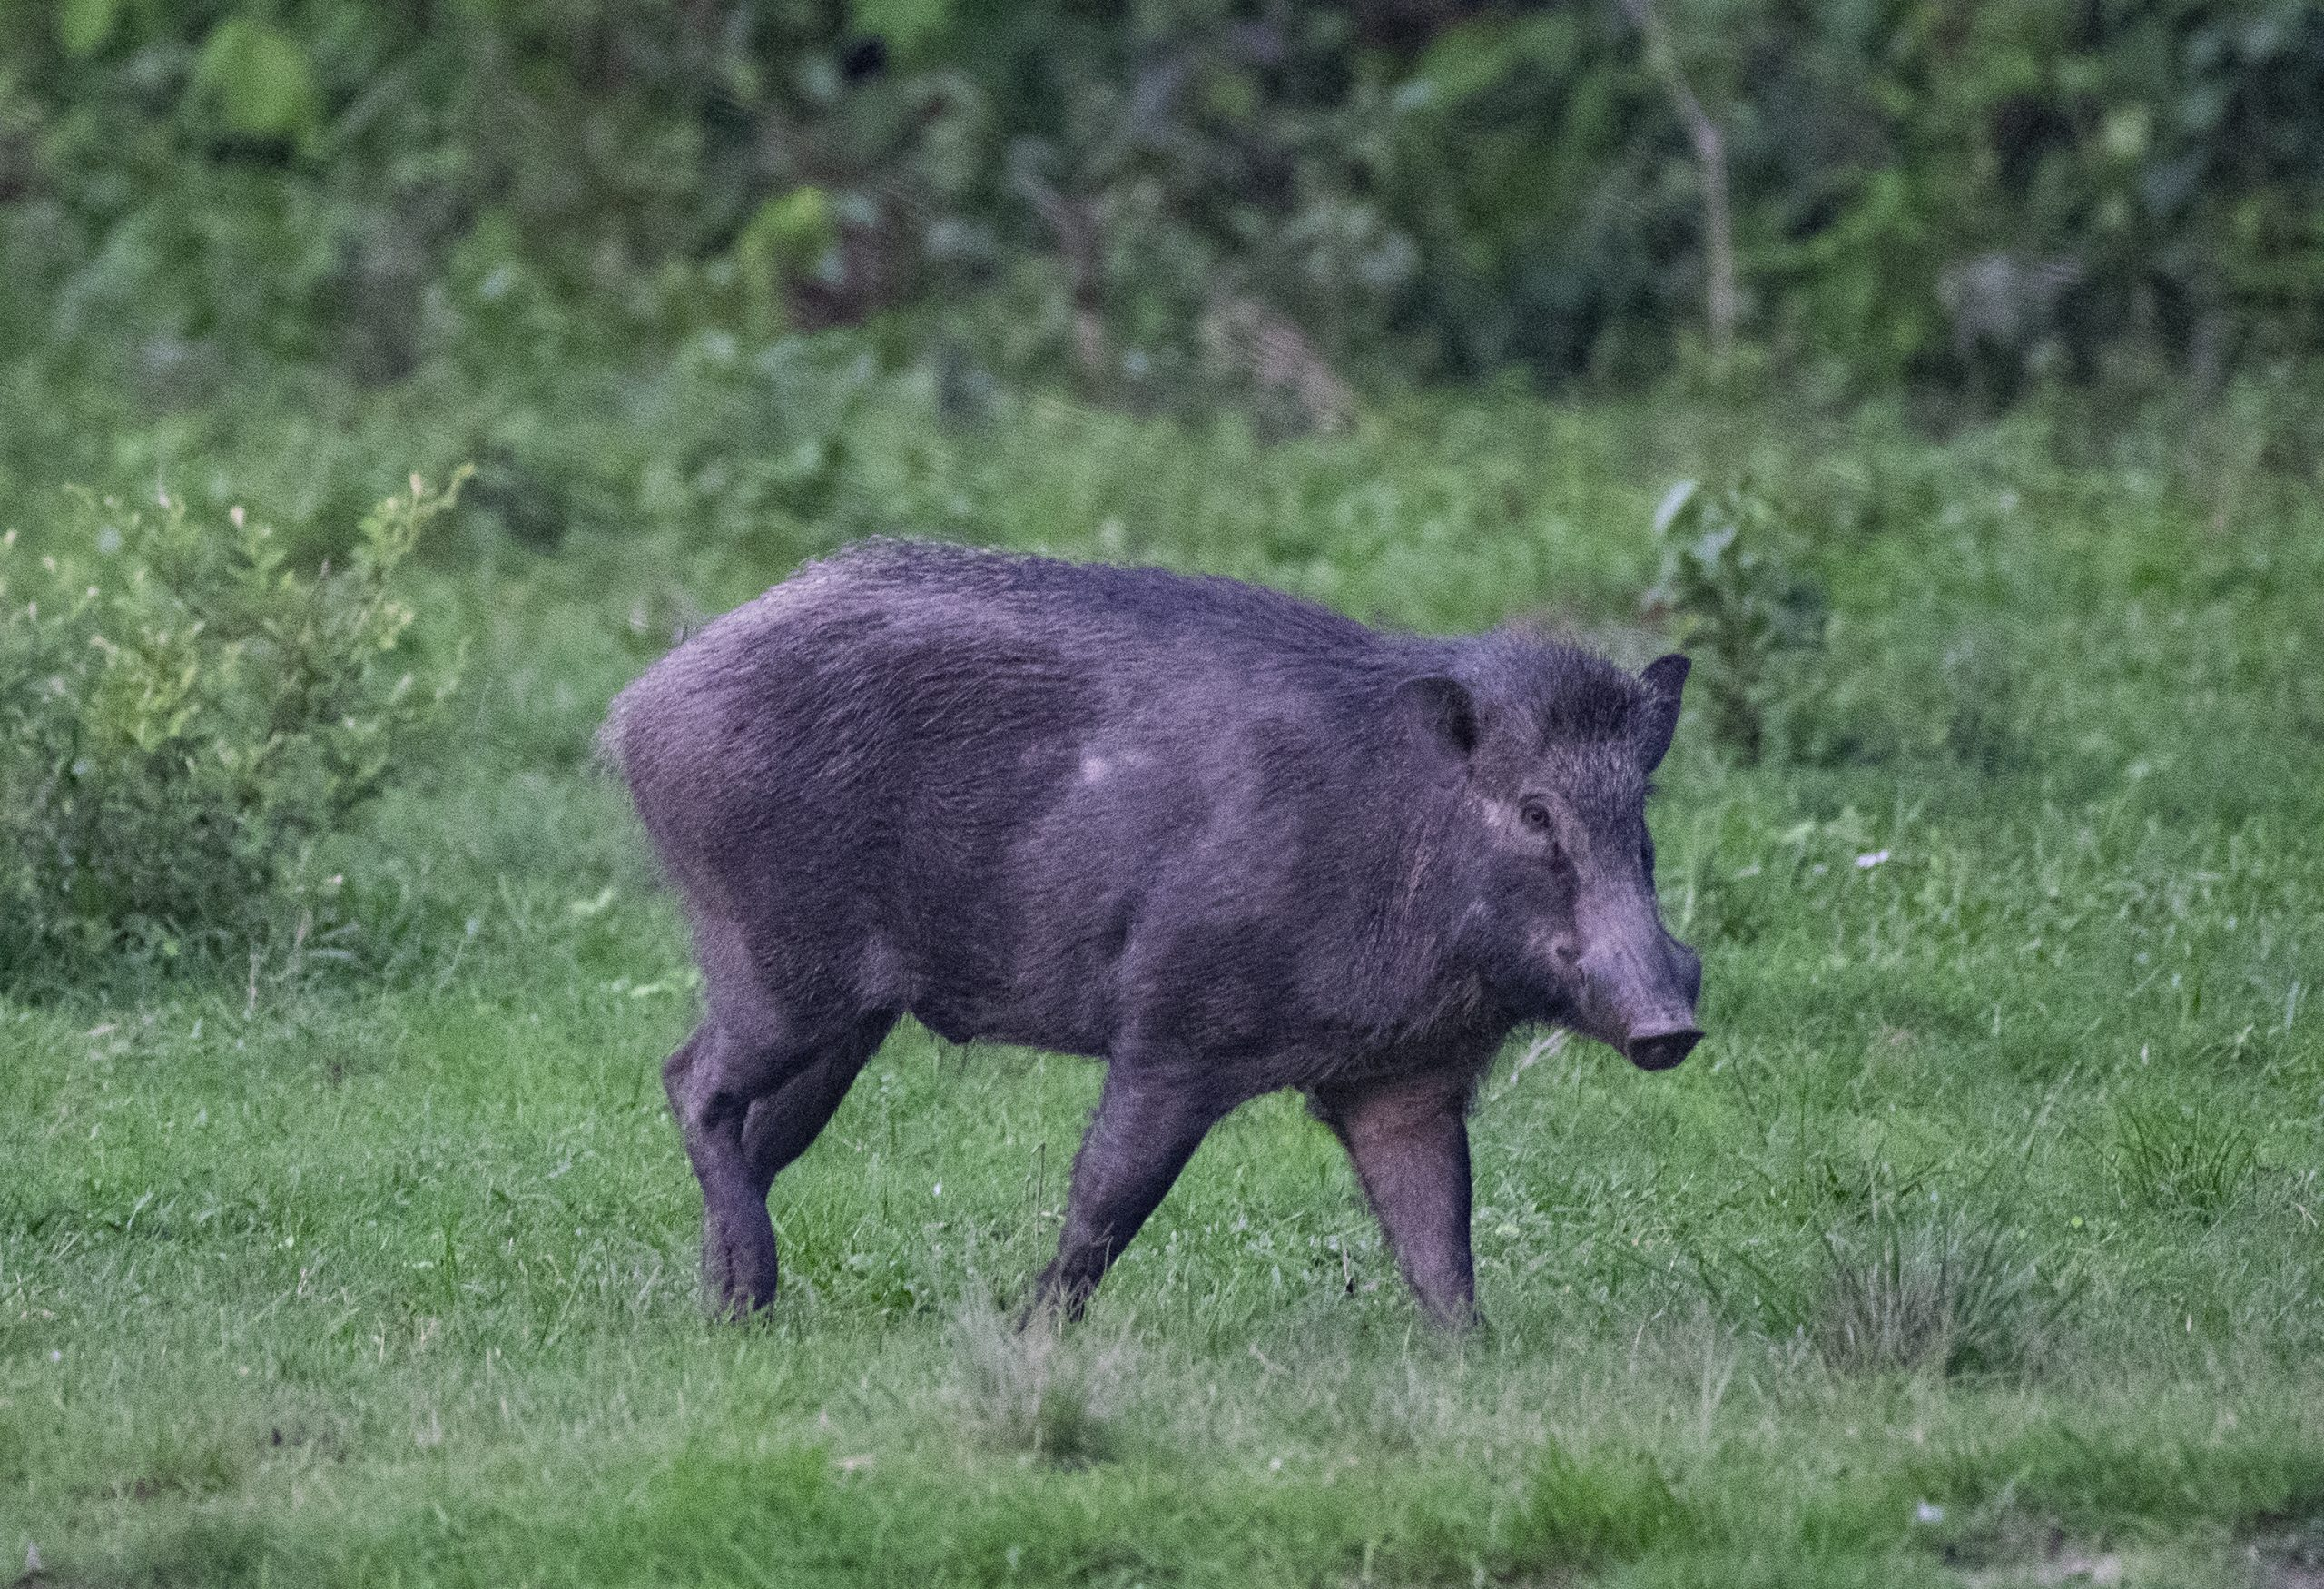 The loner wild boar